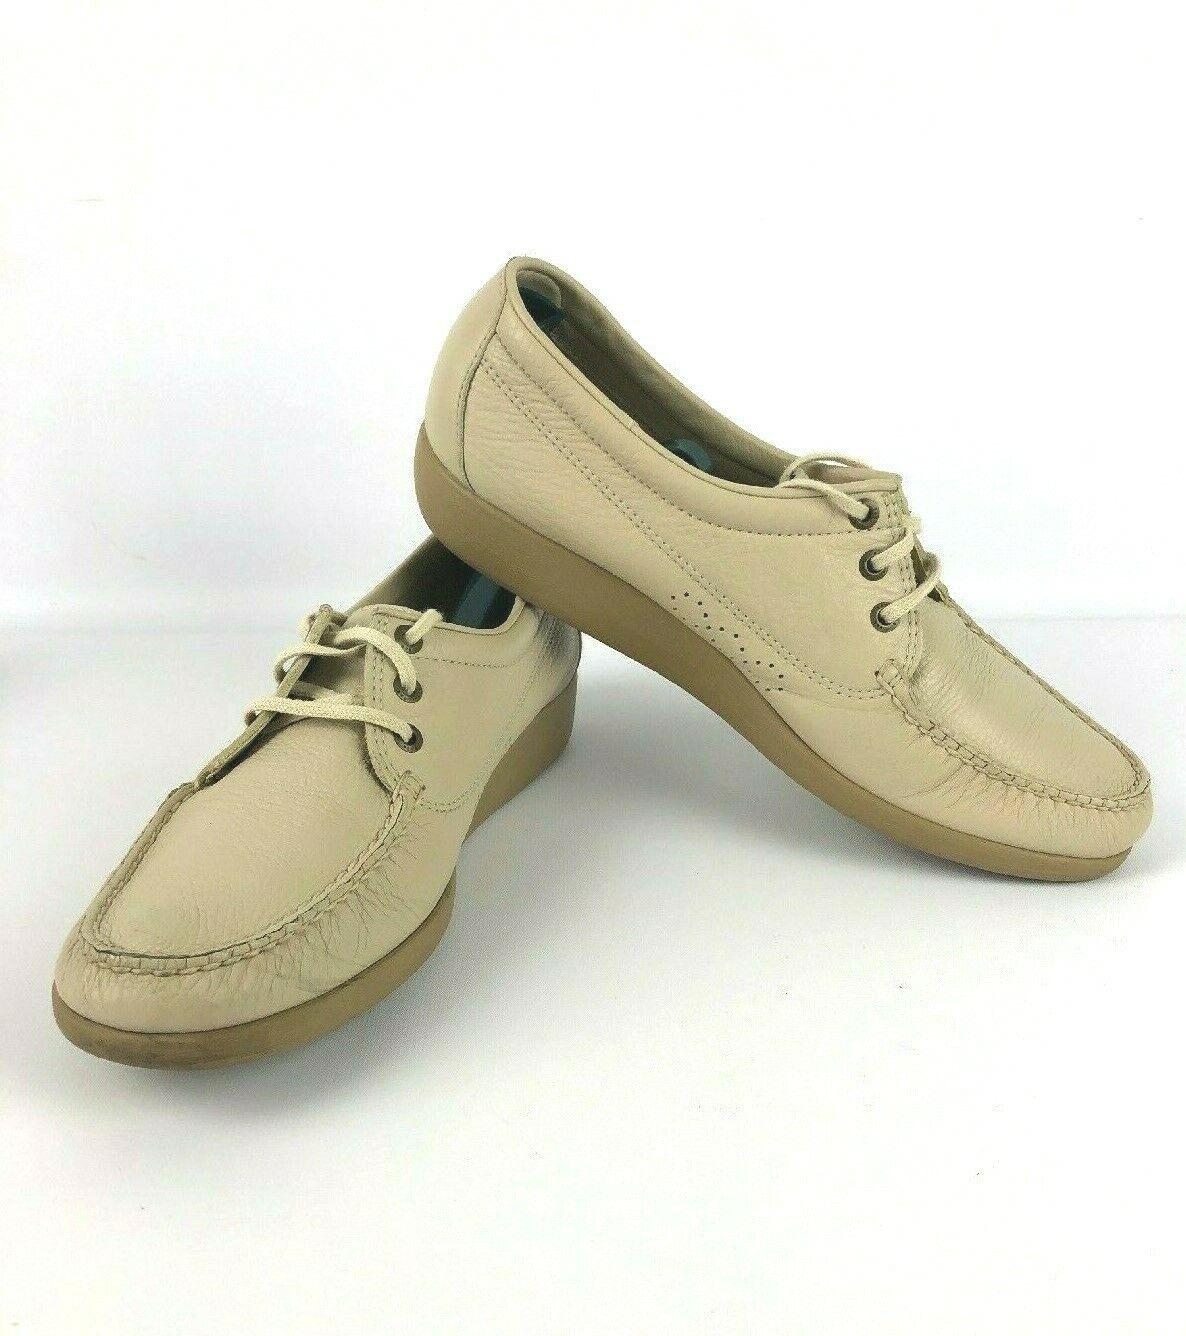 SAS Amigo Cream Leather Casual Walking Nursing Moc Toe shoes Men Size 12.5N